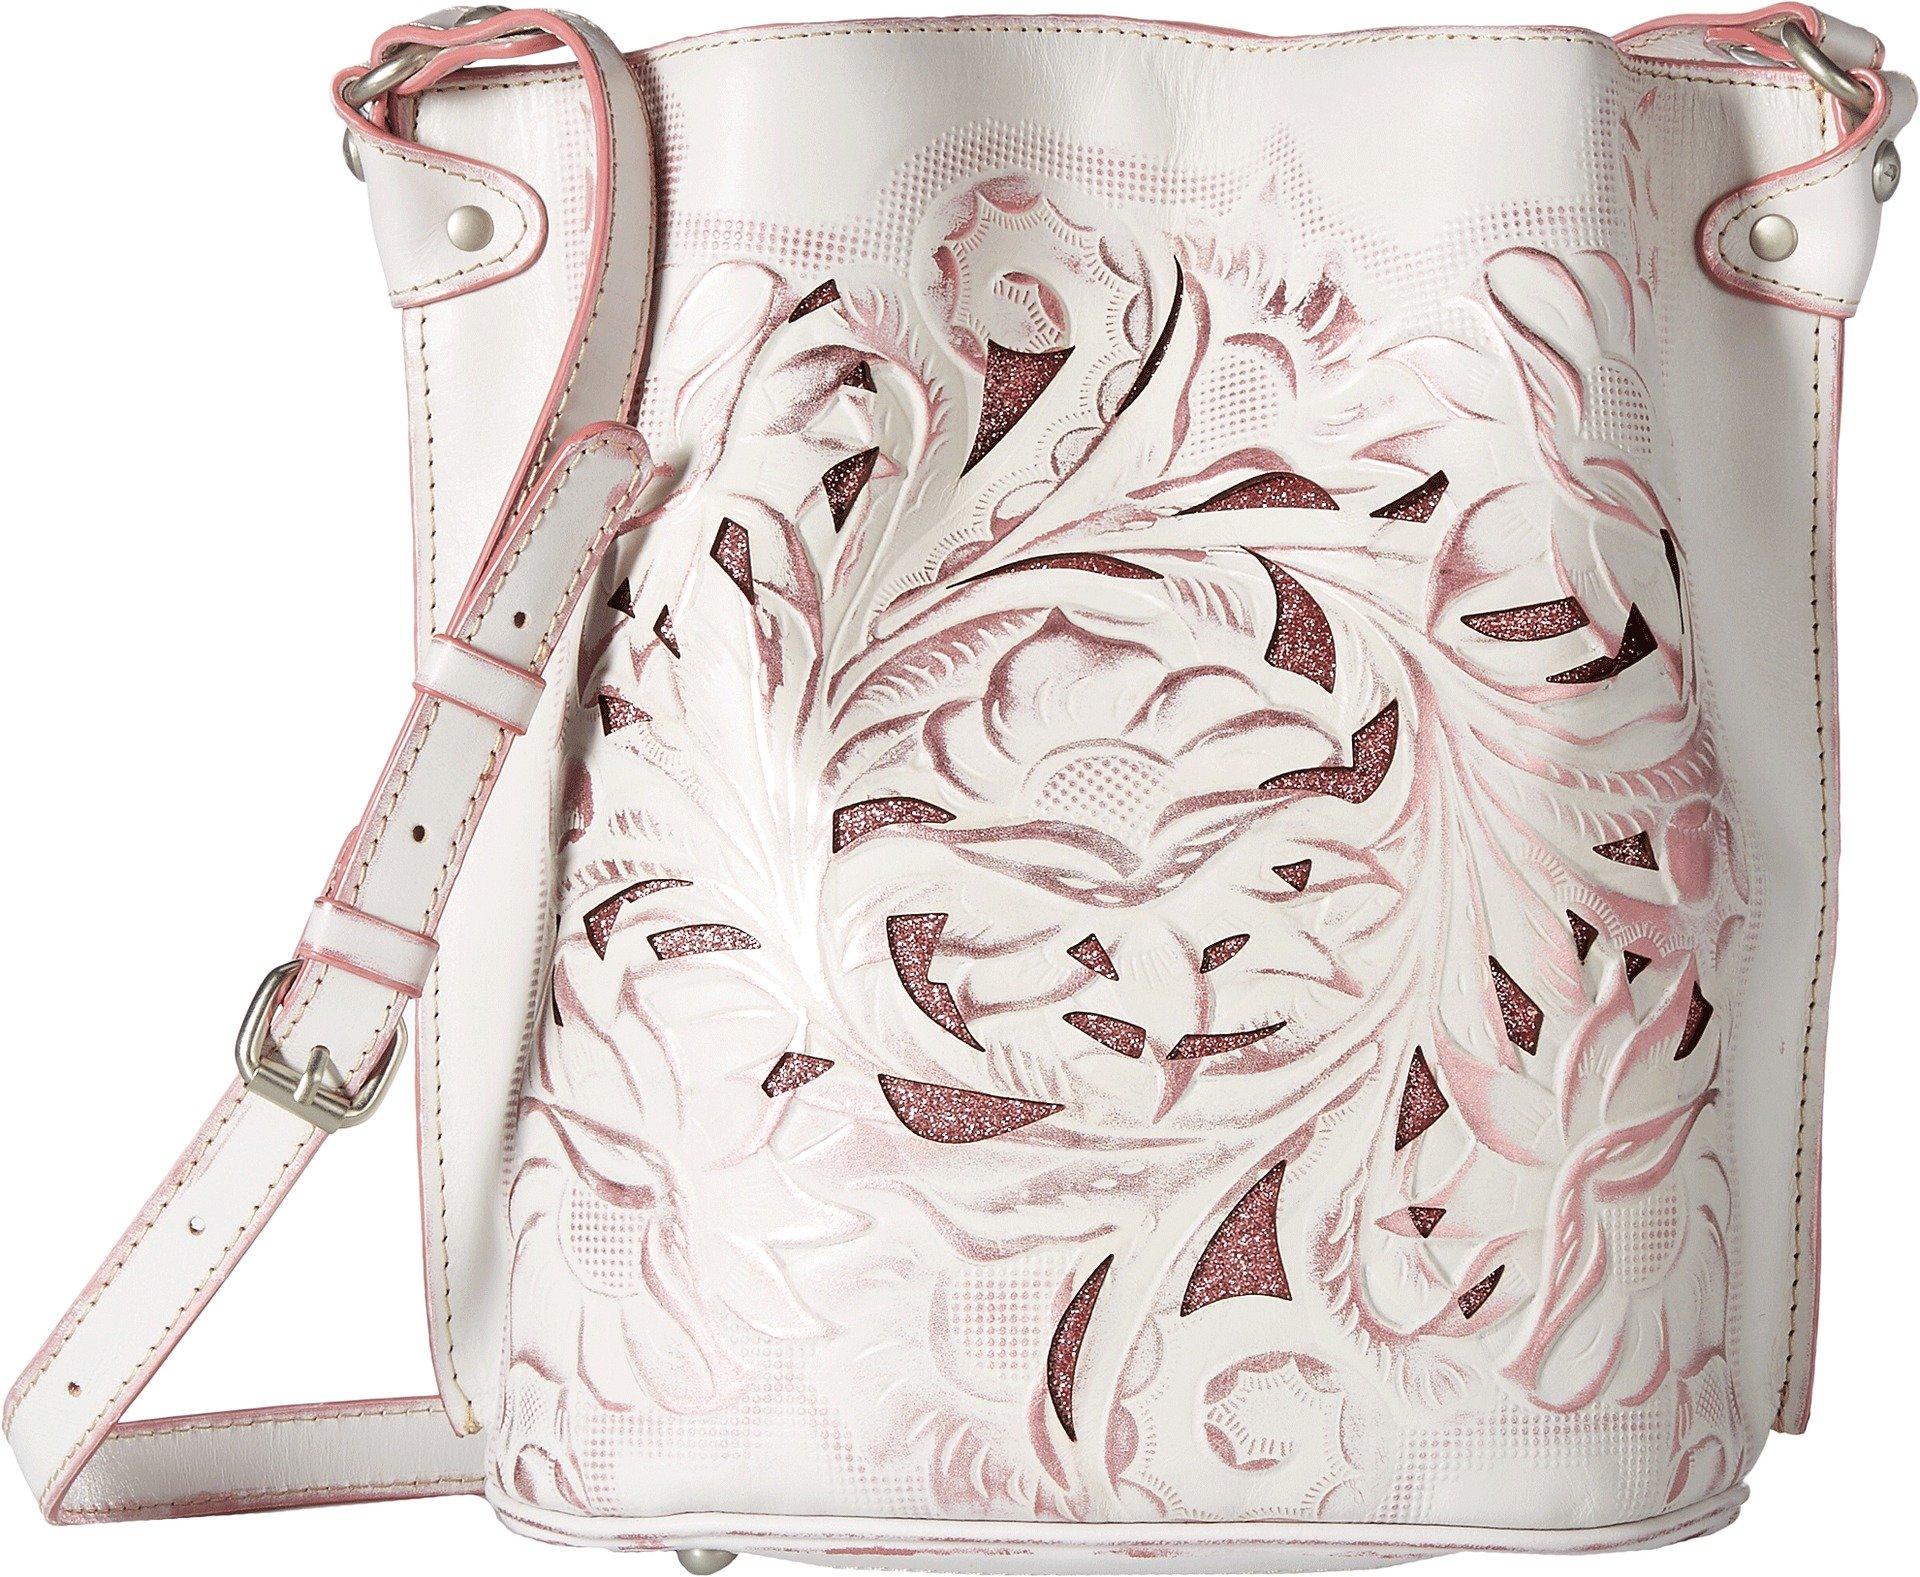 Patricia Nash Women's Lavello Sling White/Pink One Size